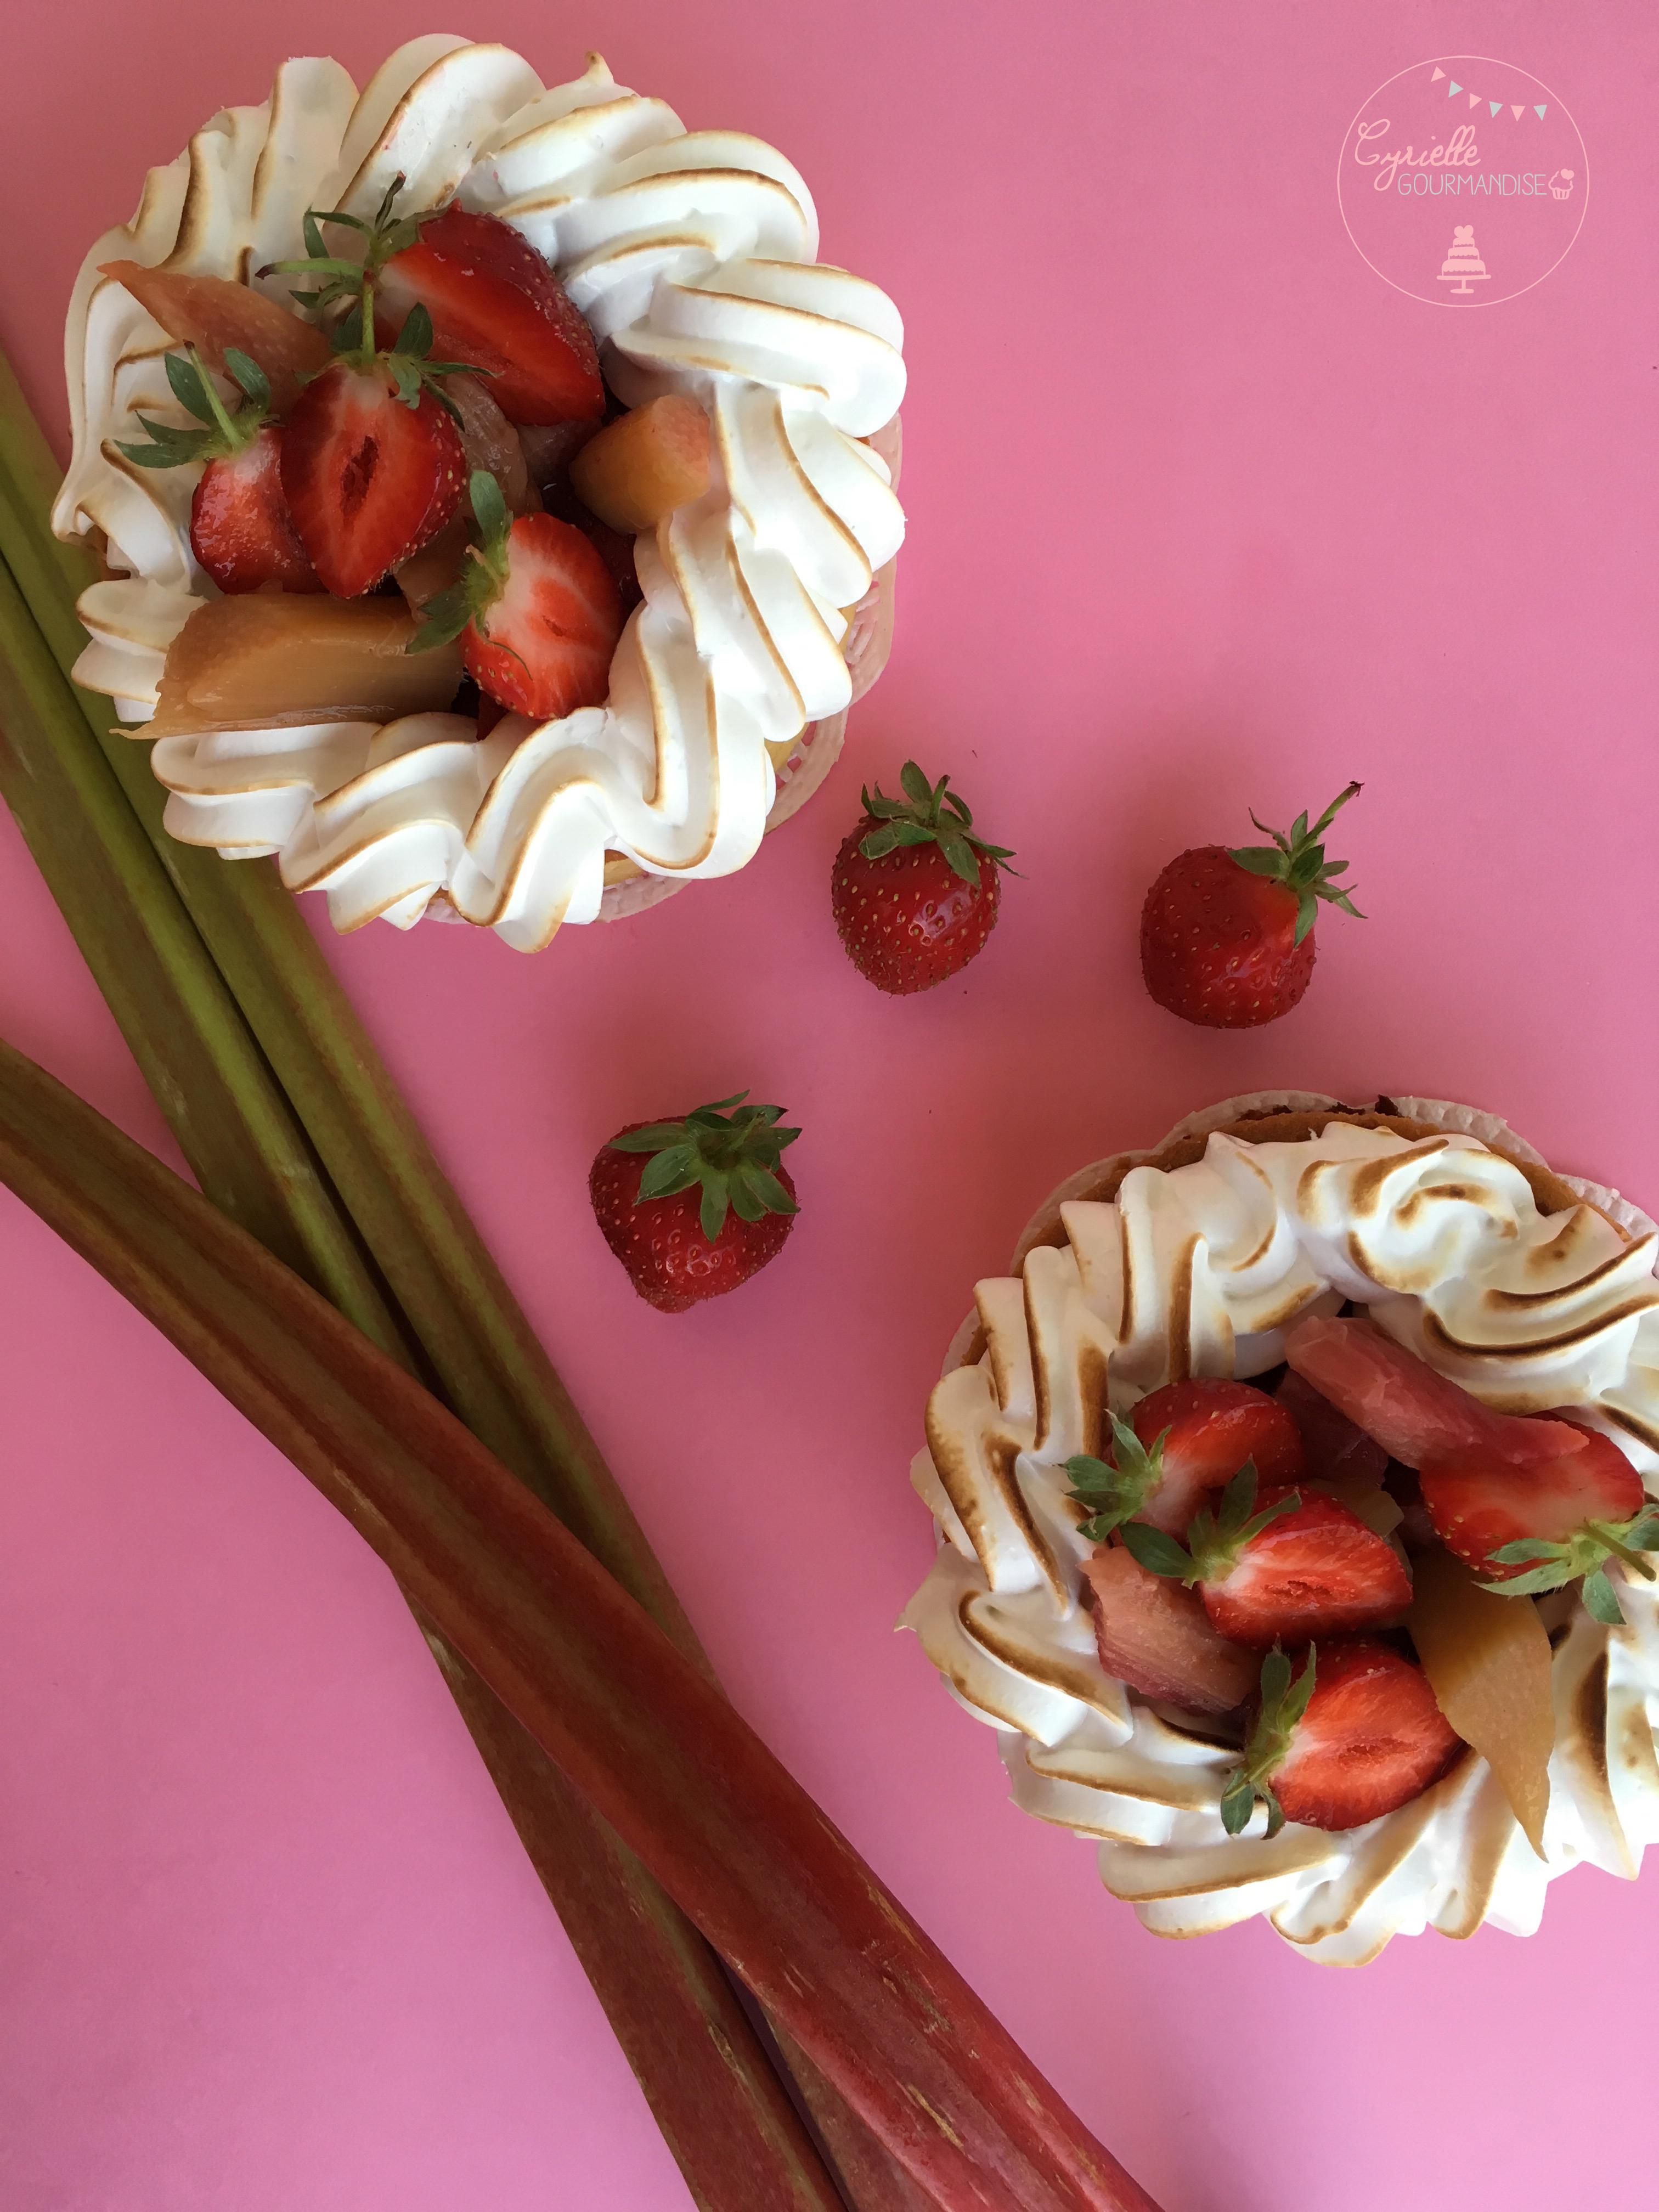 Tarte rhubarbe fraise meringuée 2